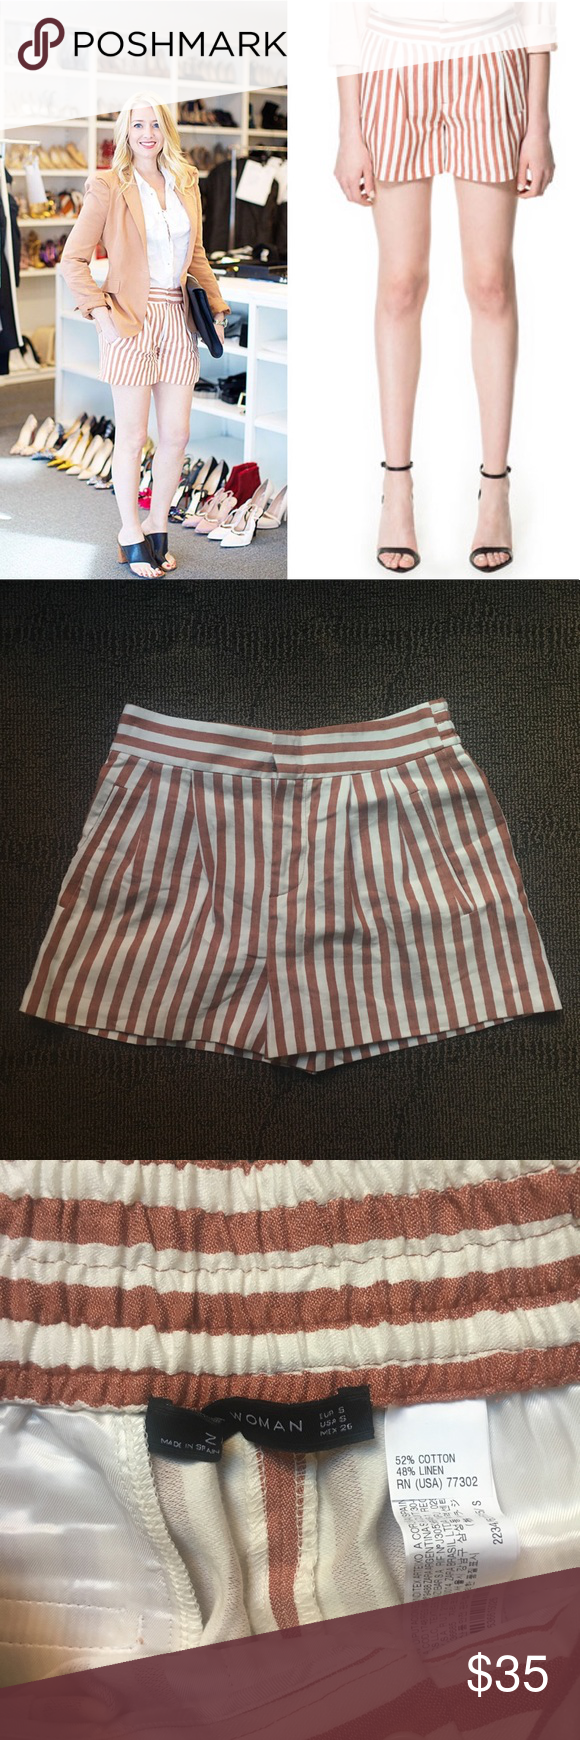 84af832b12 ZARA - High waisted Striped shorts Orange, S Zara's eponymous High waisted  short in a deep rusty orange color set over a Cream denim weave fabric The  ...